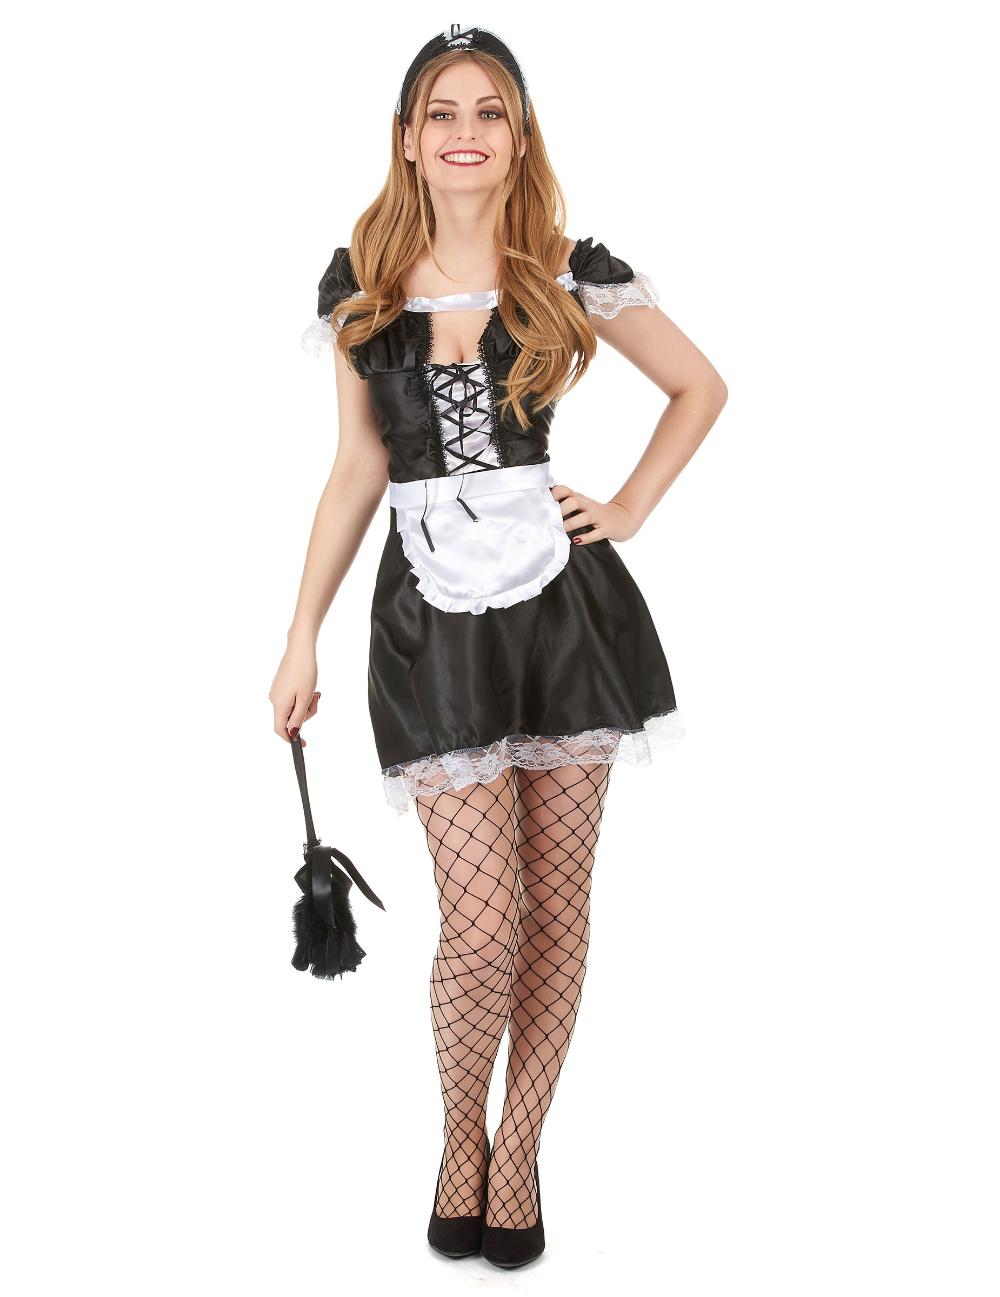 Ragazze Halloween Fantasia Abito Bianco e Nero Harlequin Calze